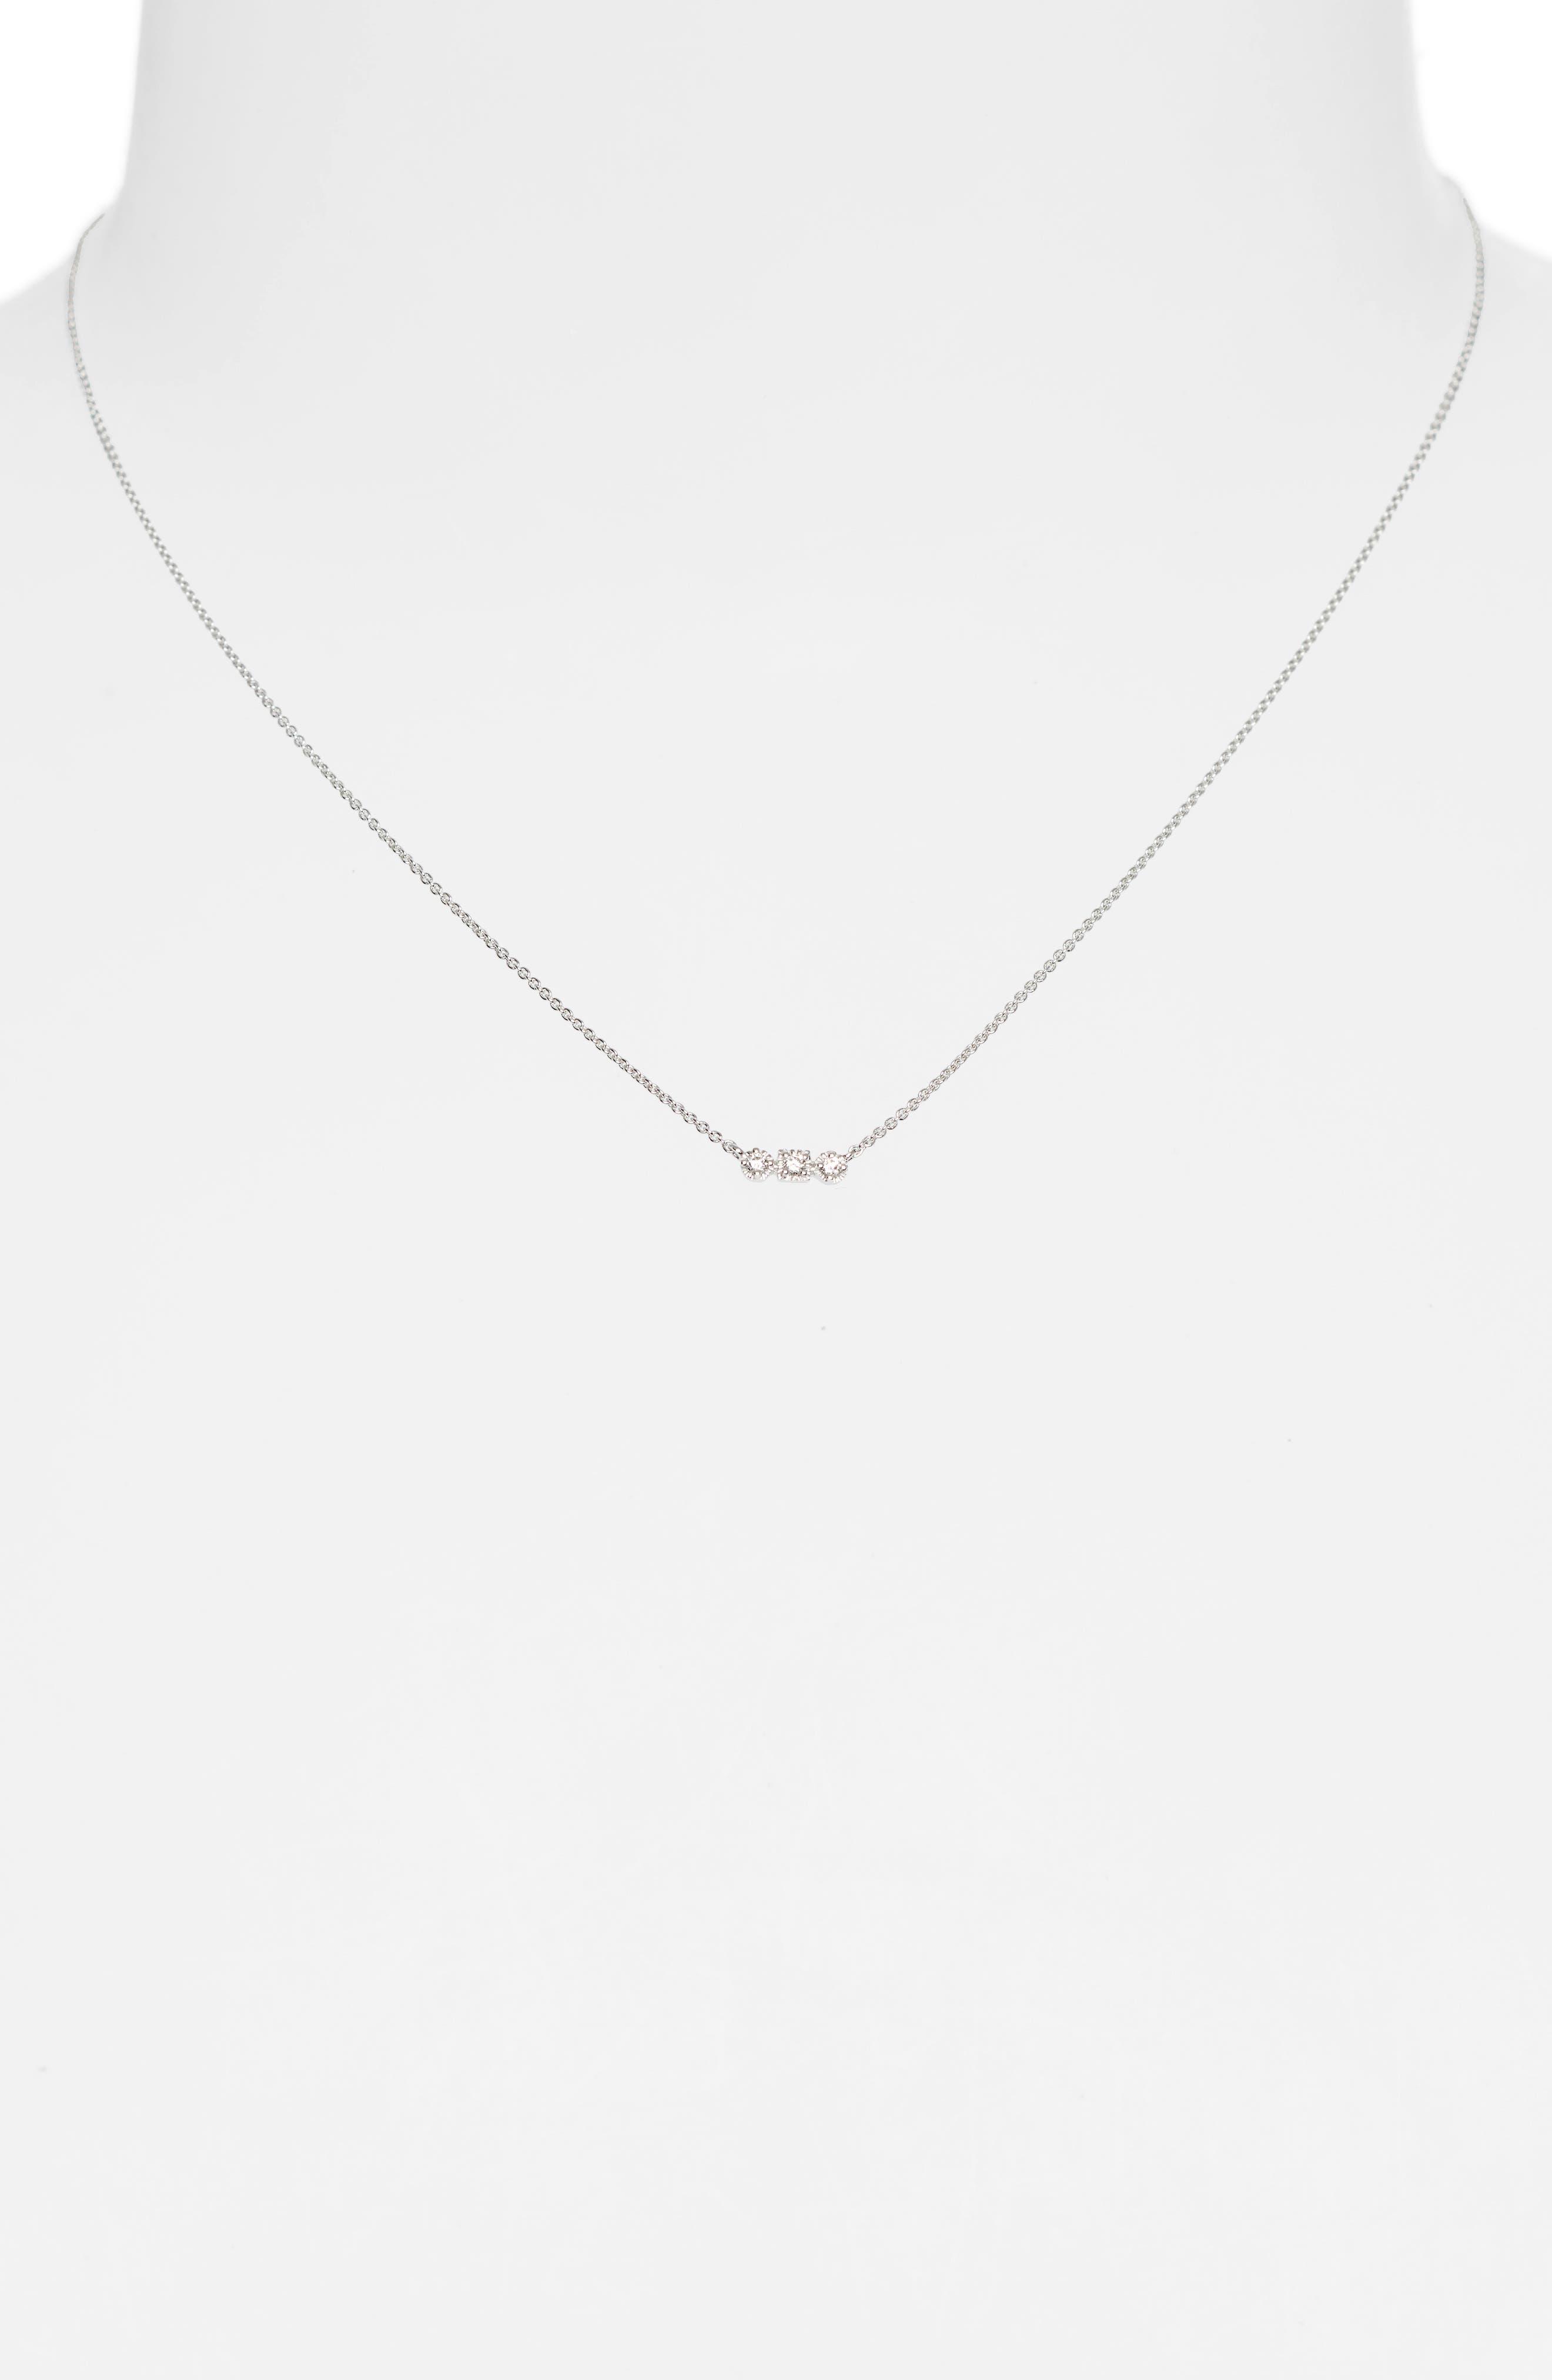 Maya 3-Stone Horizontal Necklace,                             Alternate thumbnail 2, color,                             WHITE GOLD/ DIAMOND